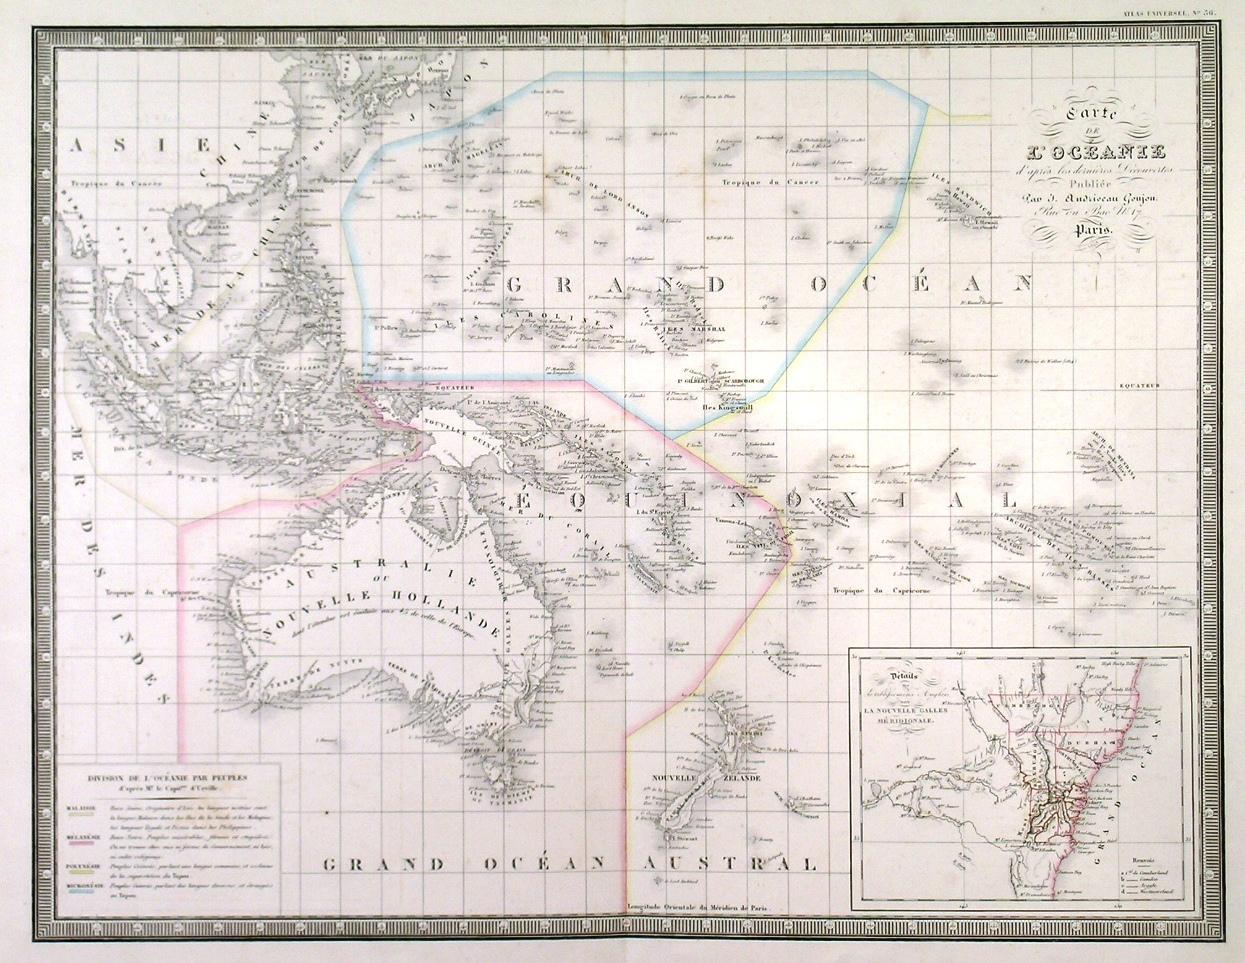 Carte Map Australia.Carte De L Oceanie Map Of Australia East